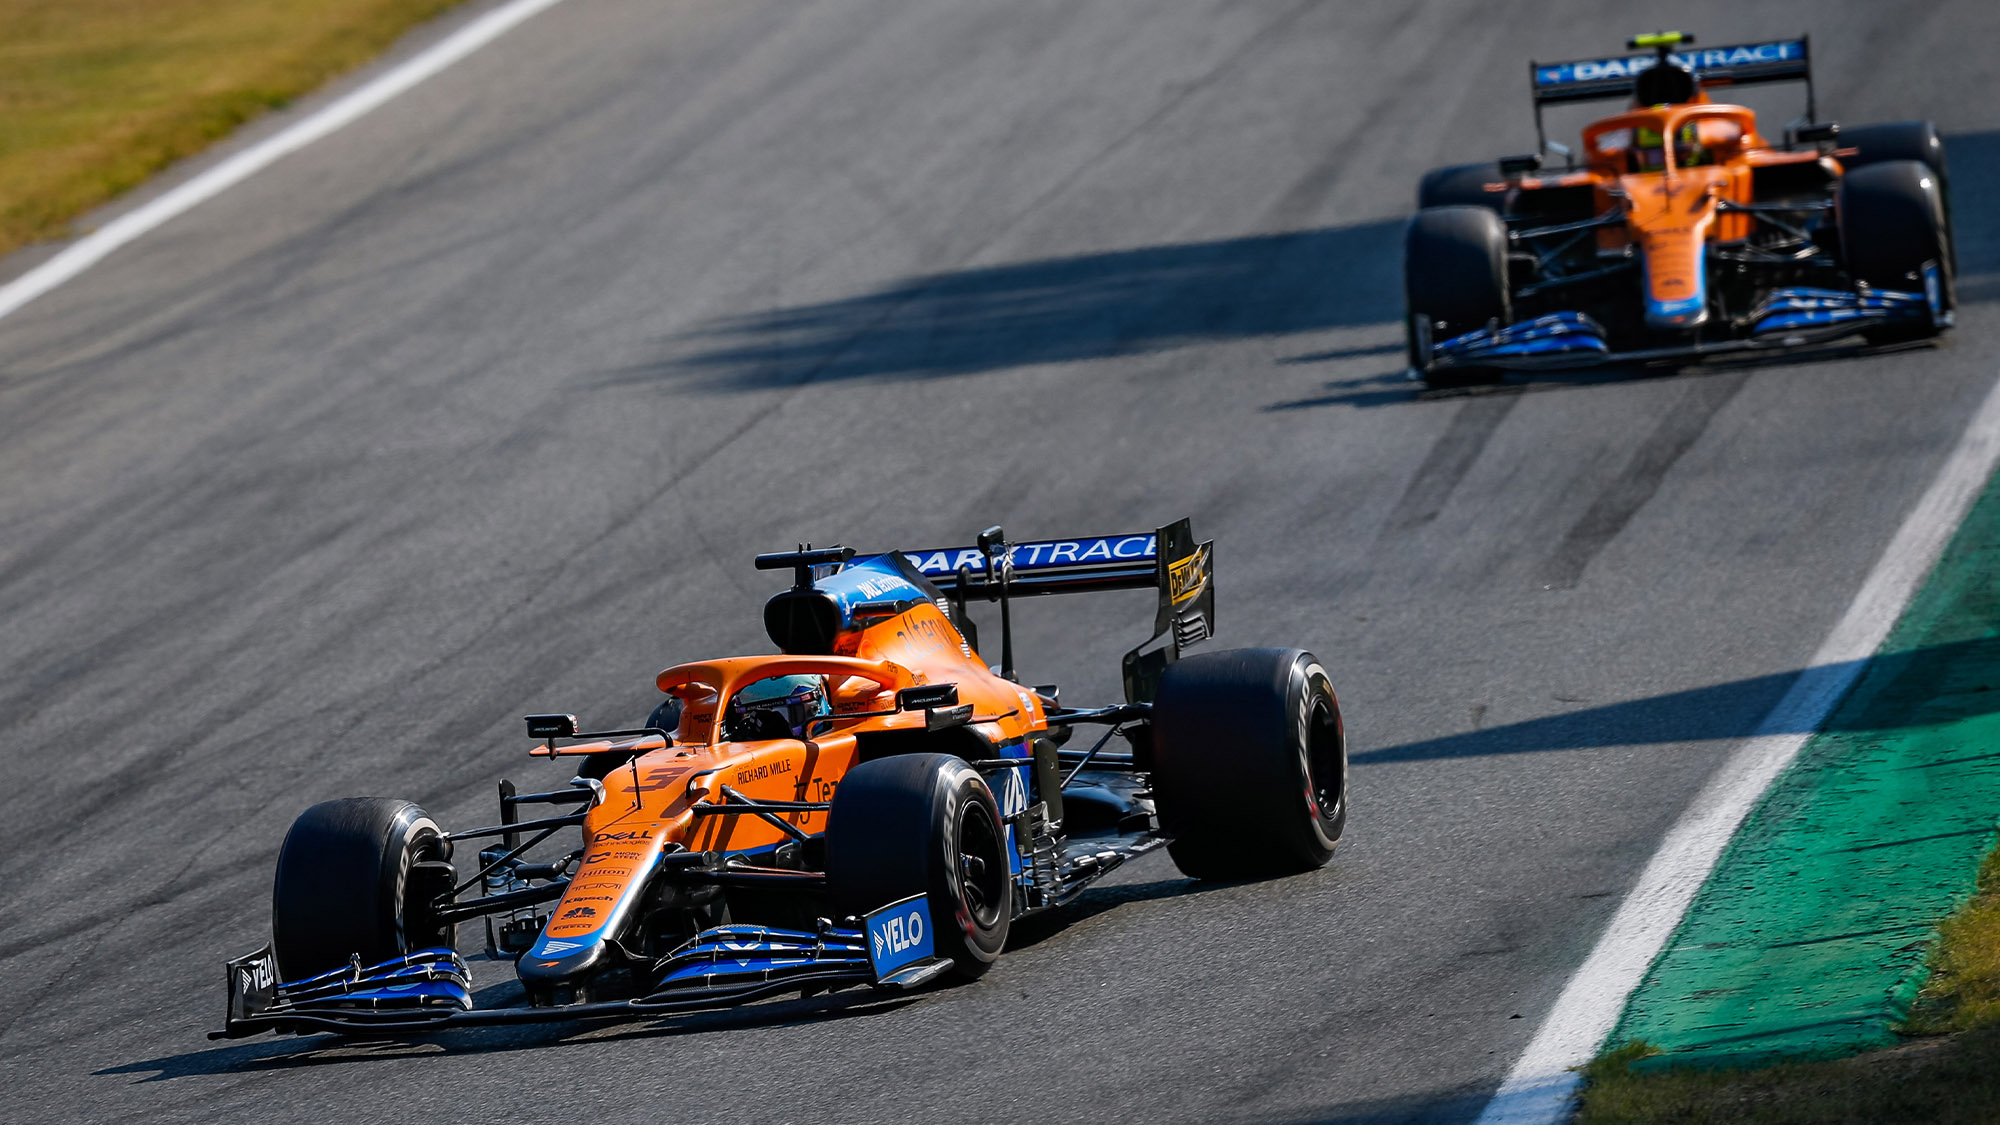 McLarens of Daniel ricciardo and Lando Norris on track at Monza